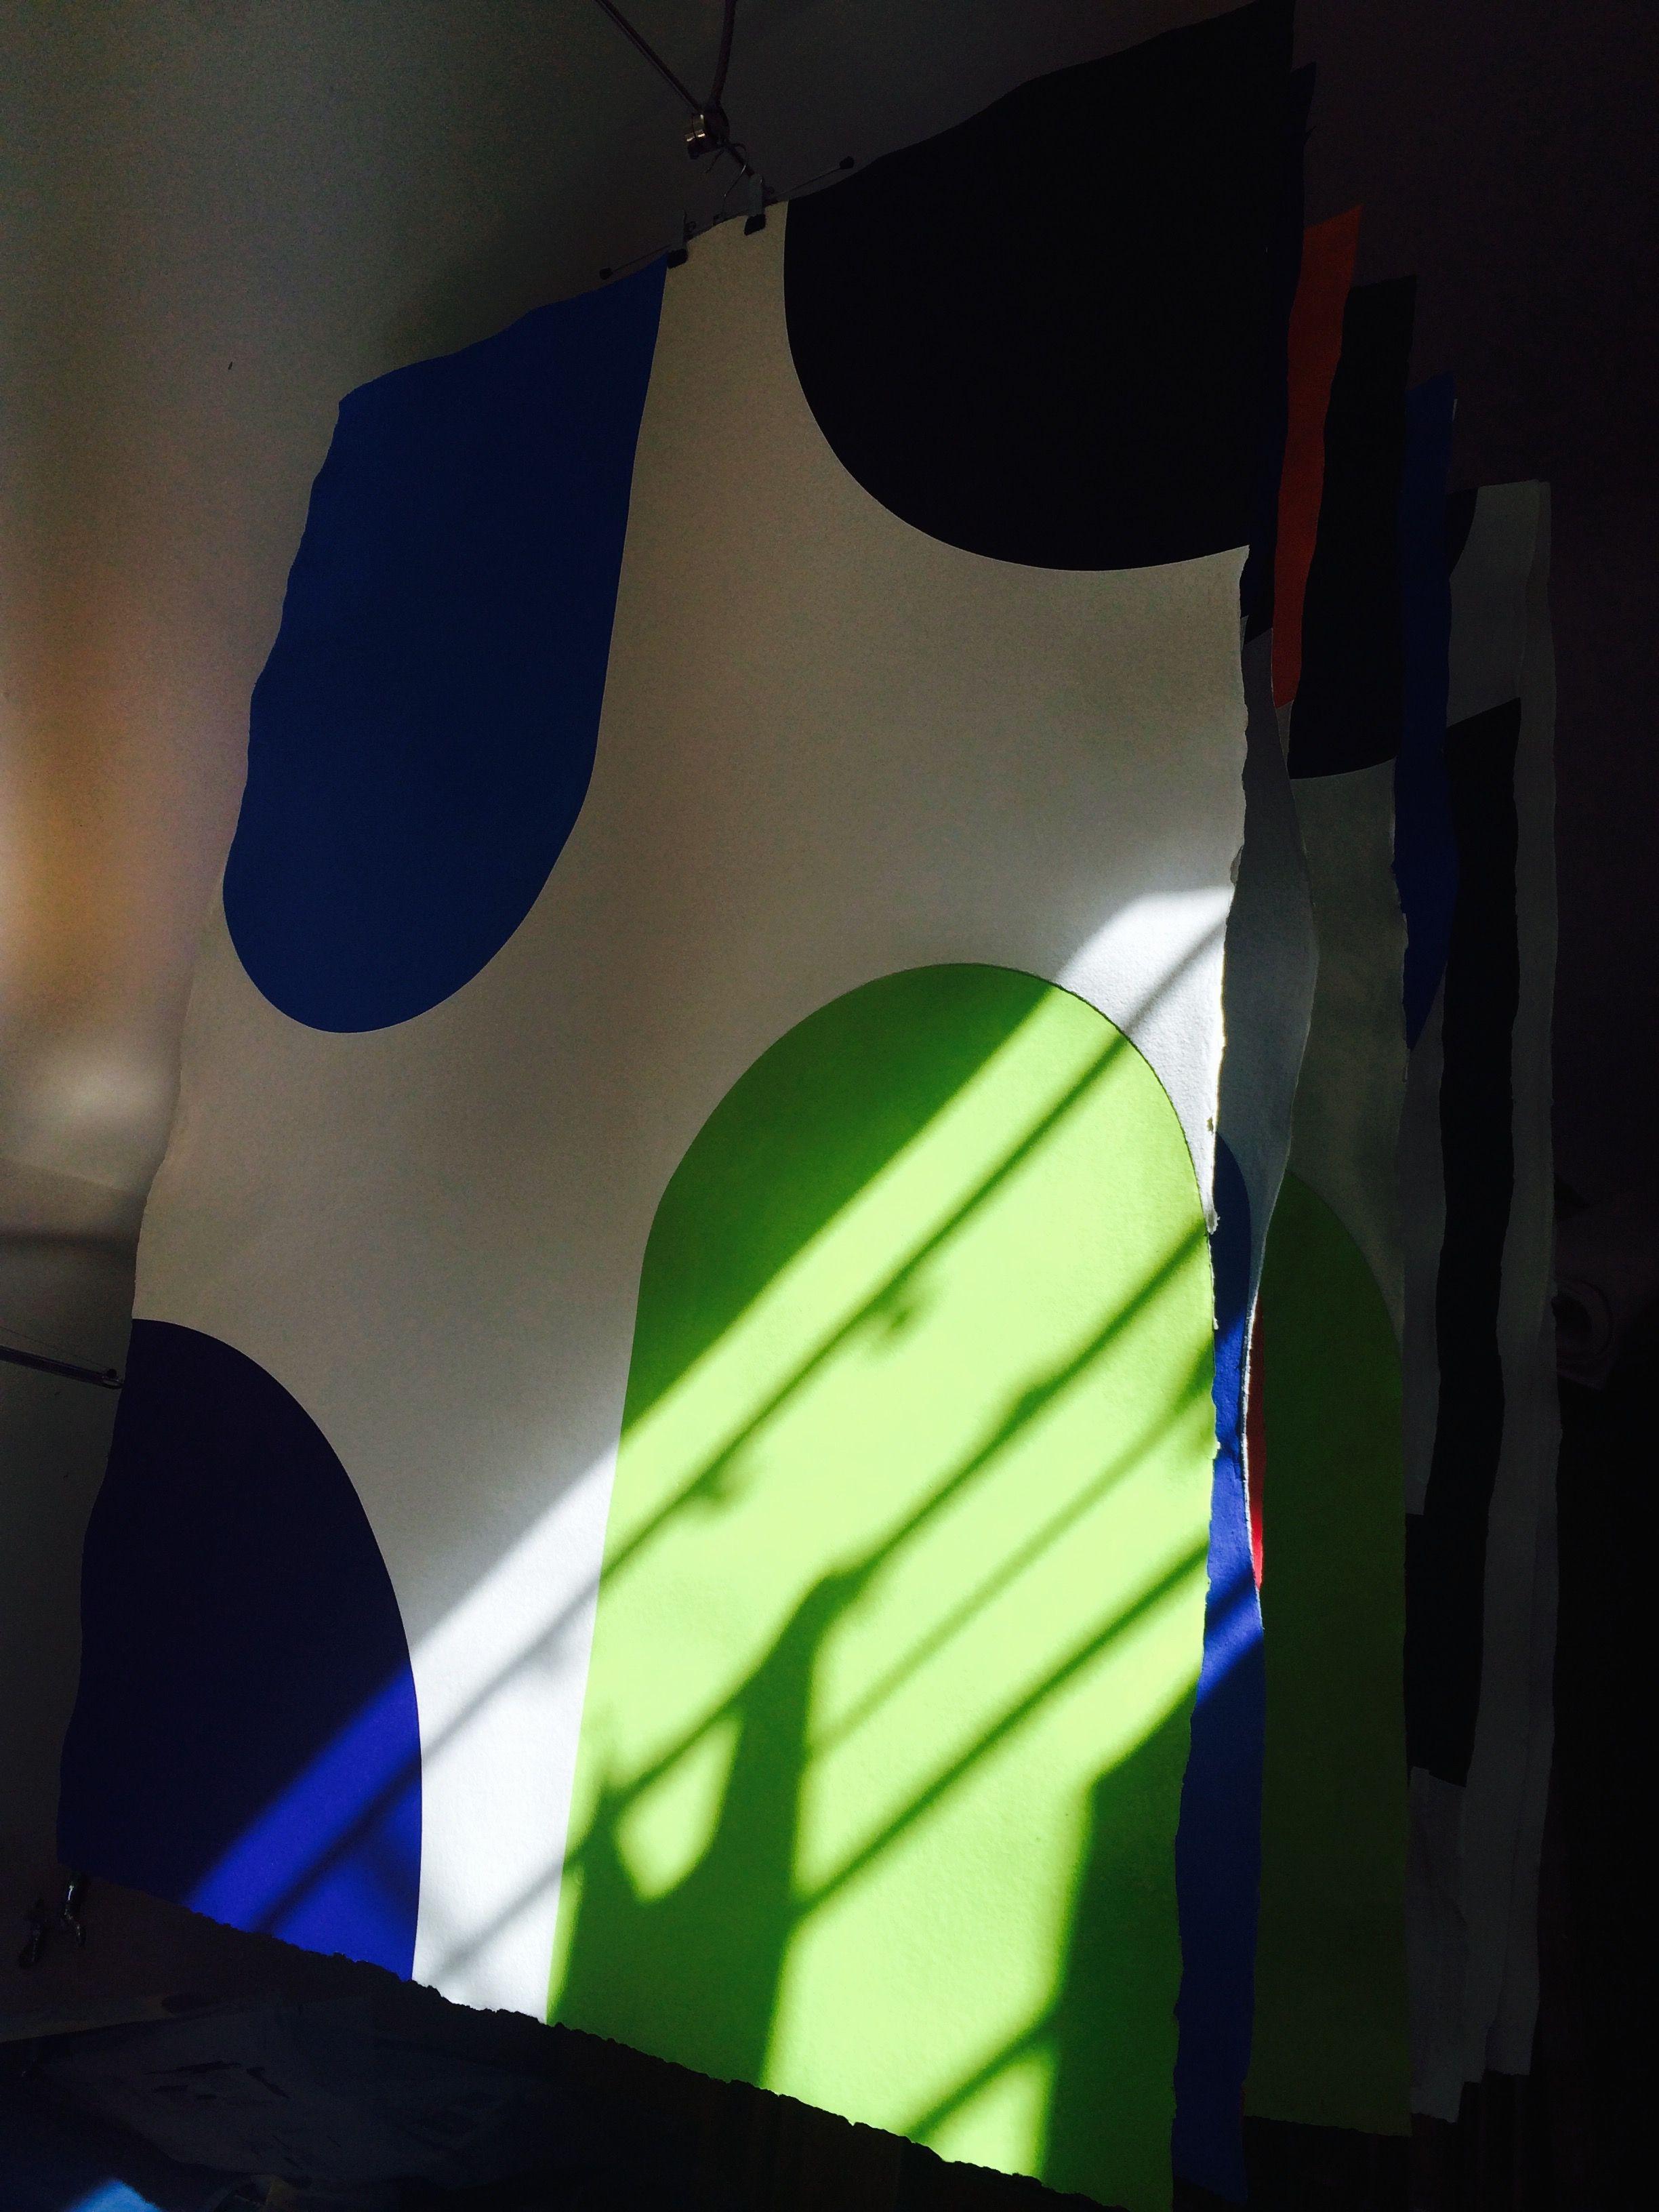 Shadows on a Richard Gorman KAN print. 2015, Carborundum on Indian Paper, Edition of 10.